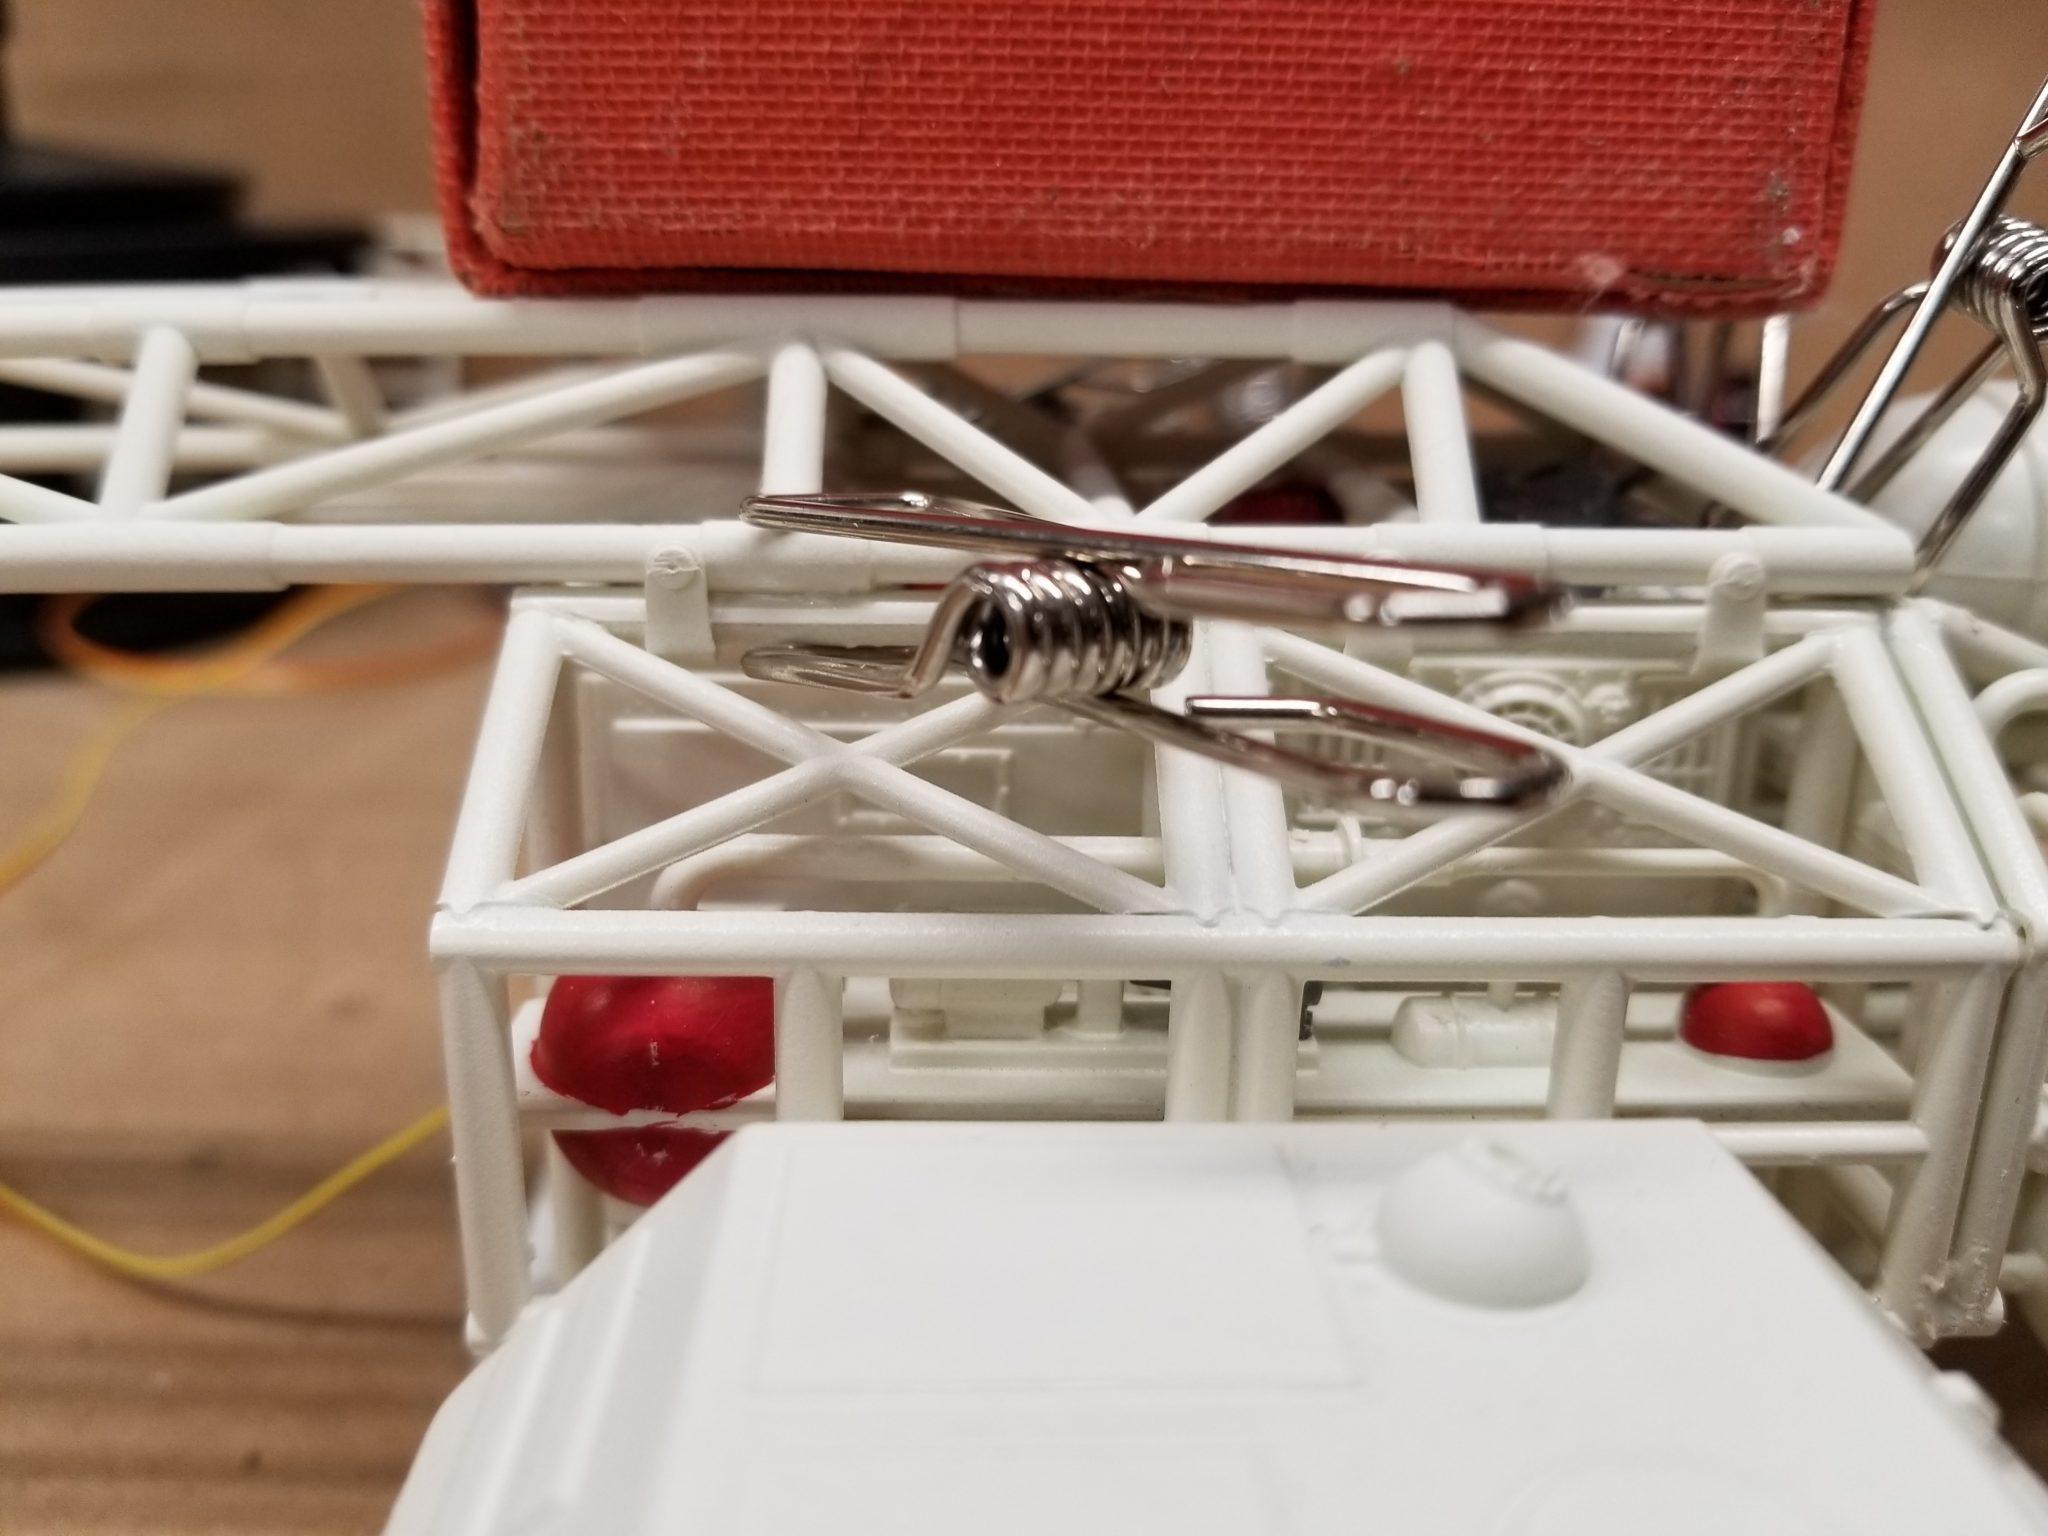 Space 1999 22″ Eagle Transporter Science Fiction replica